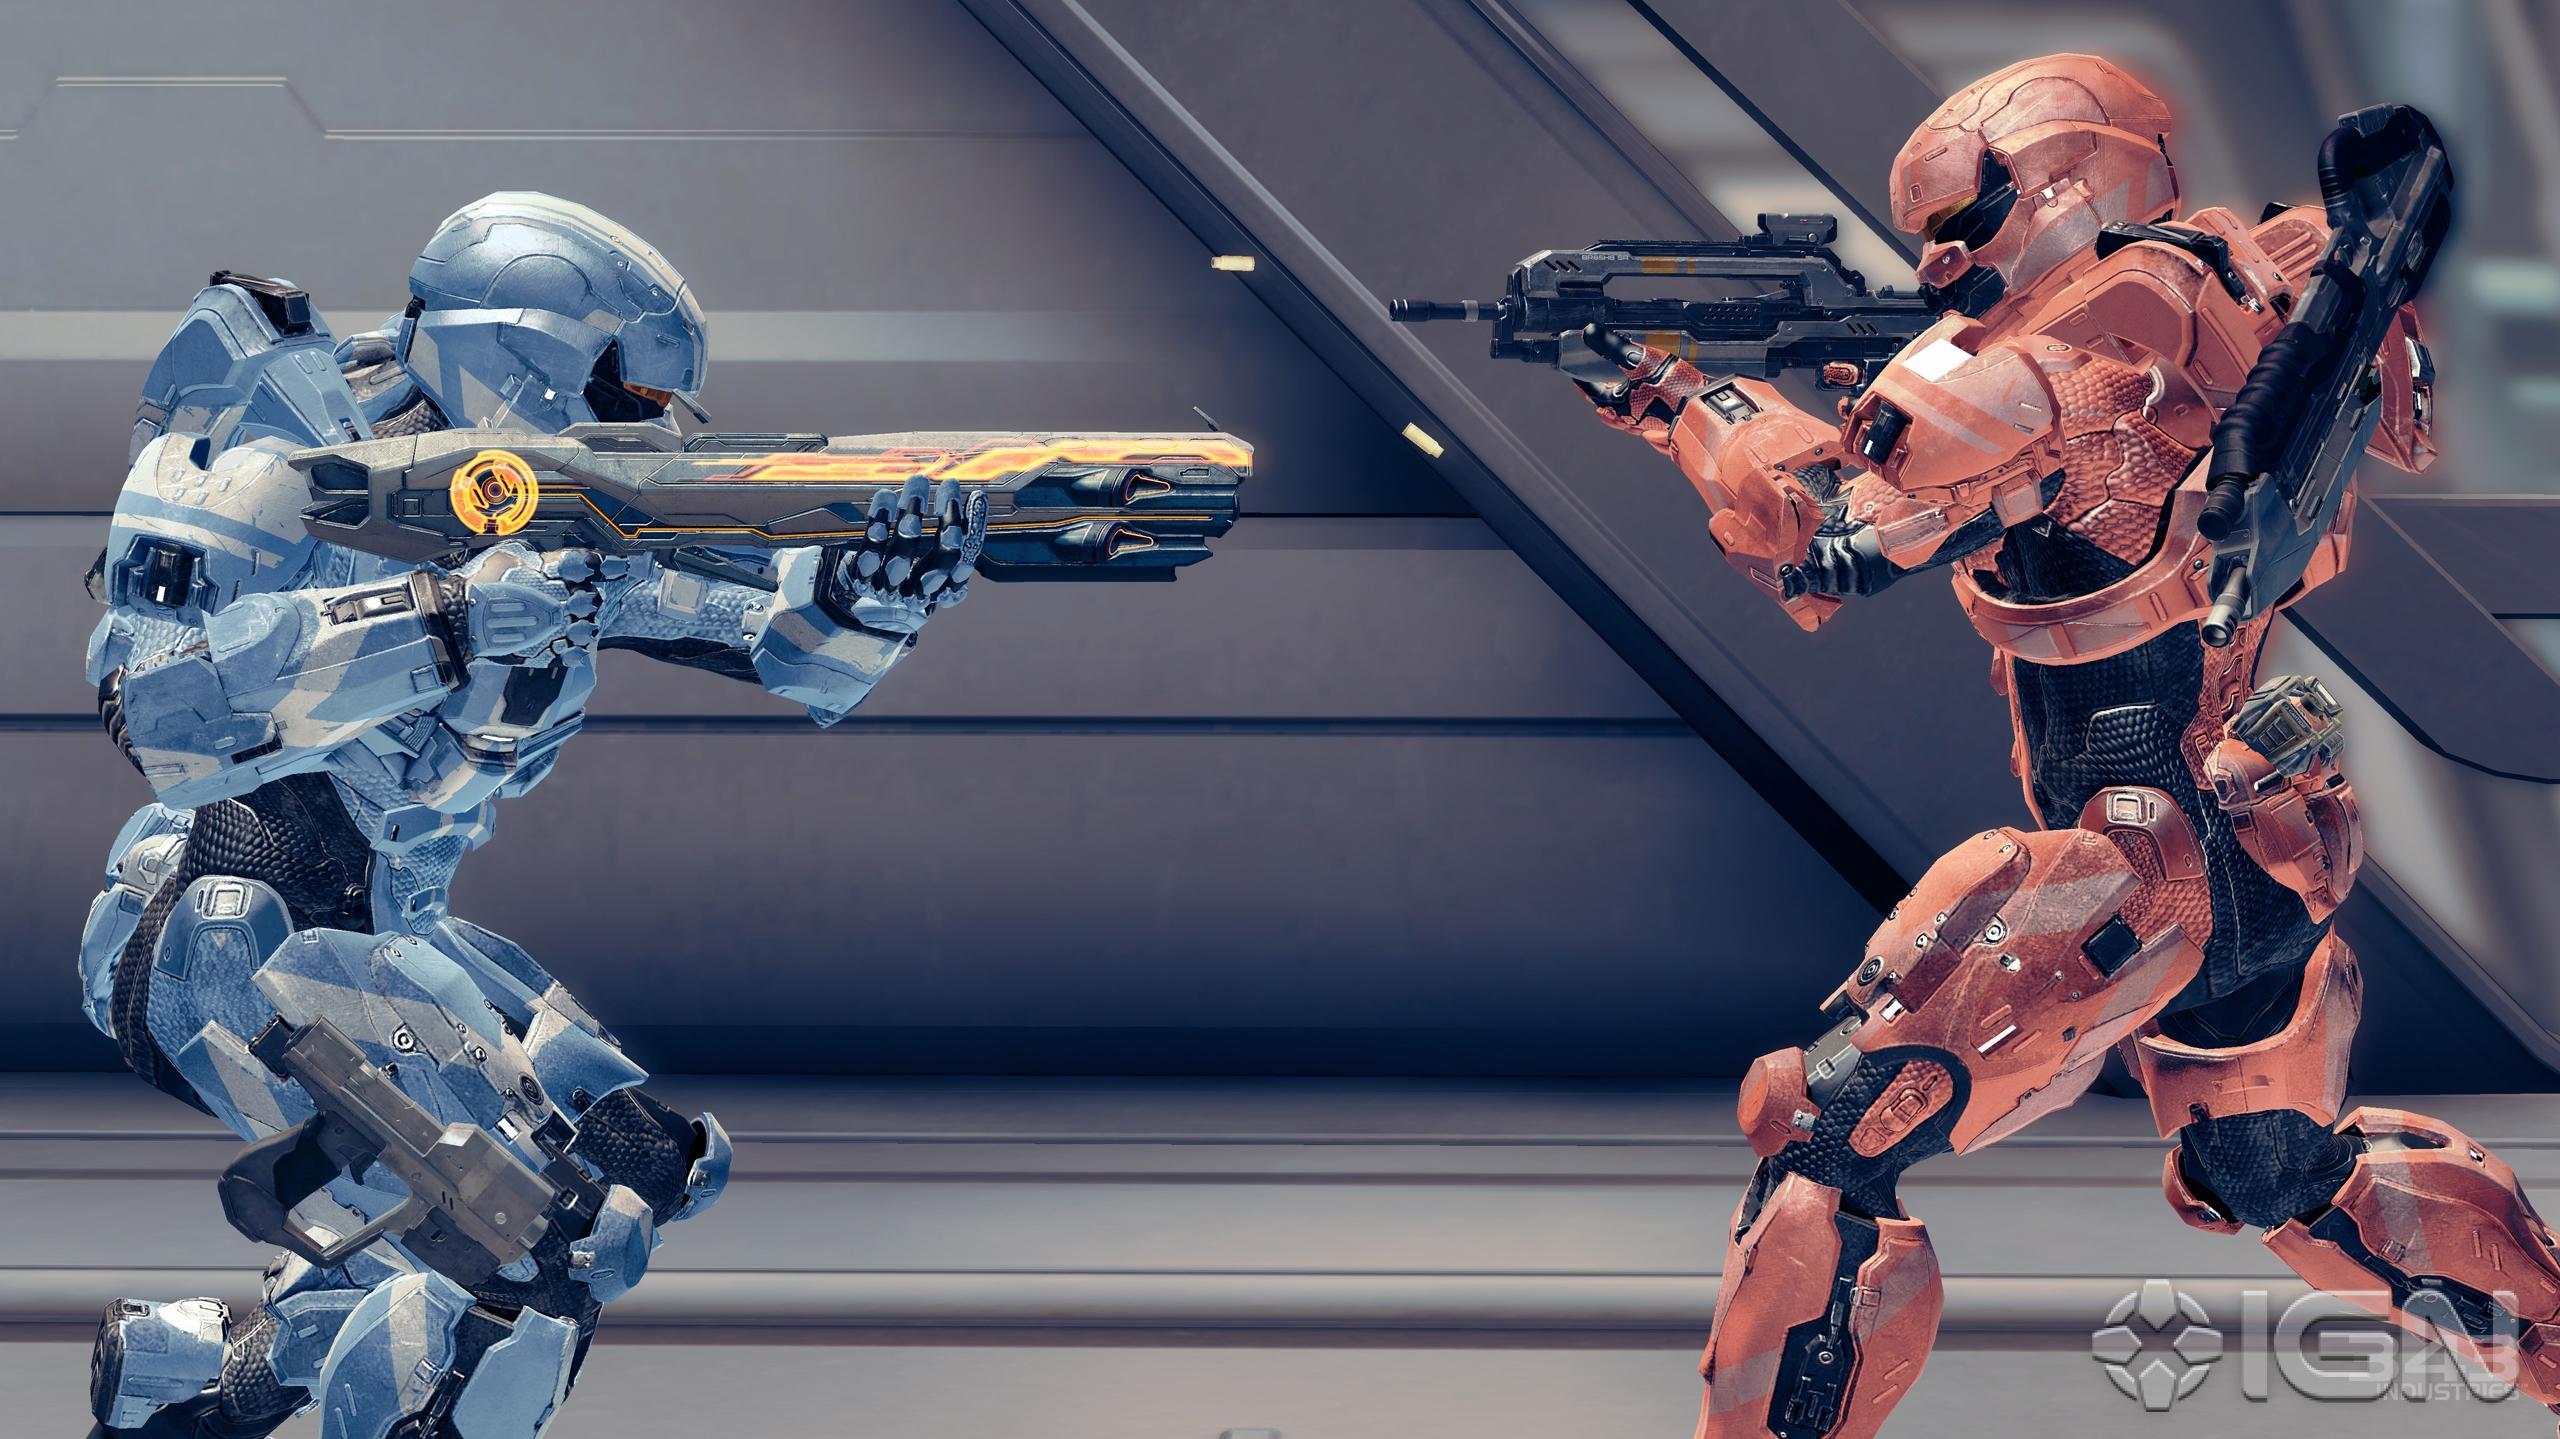 Halo 4 - Infinity Multiplayer Trailer - E3 2012